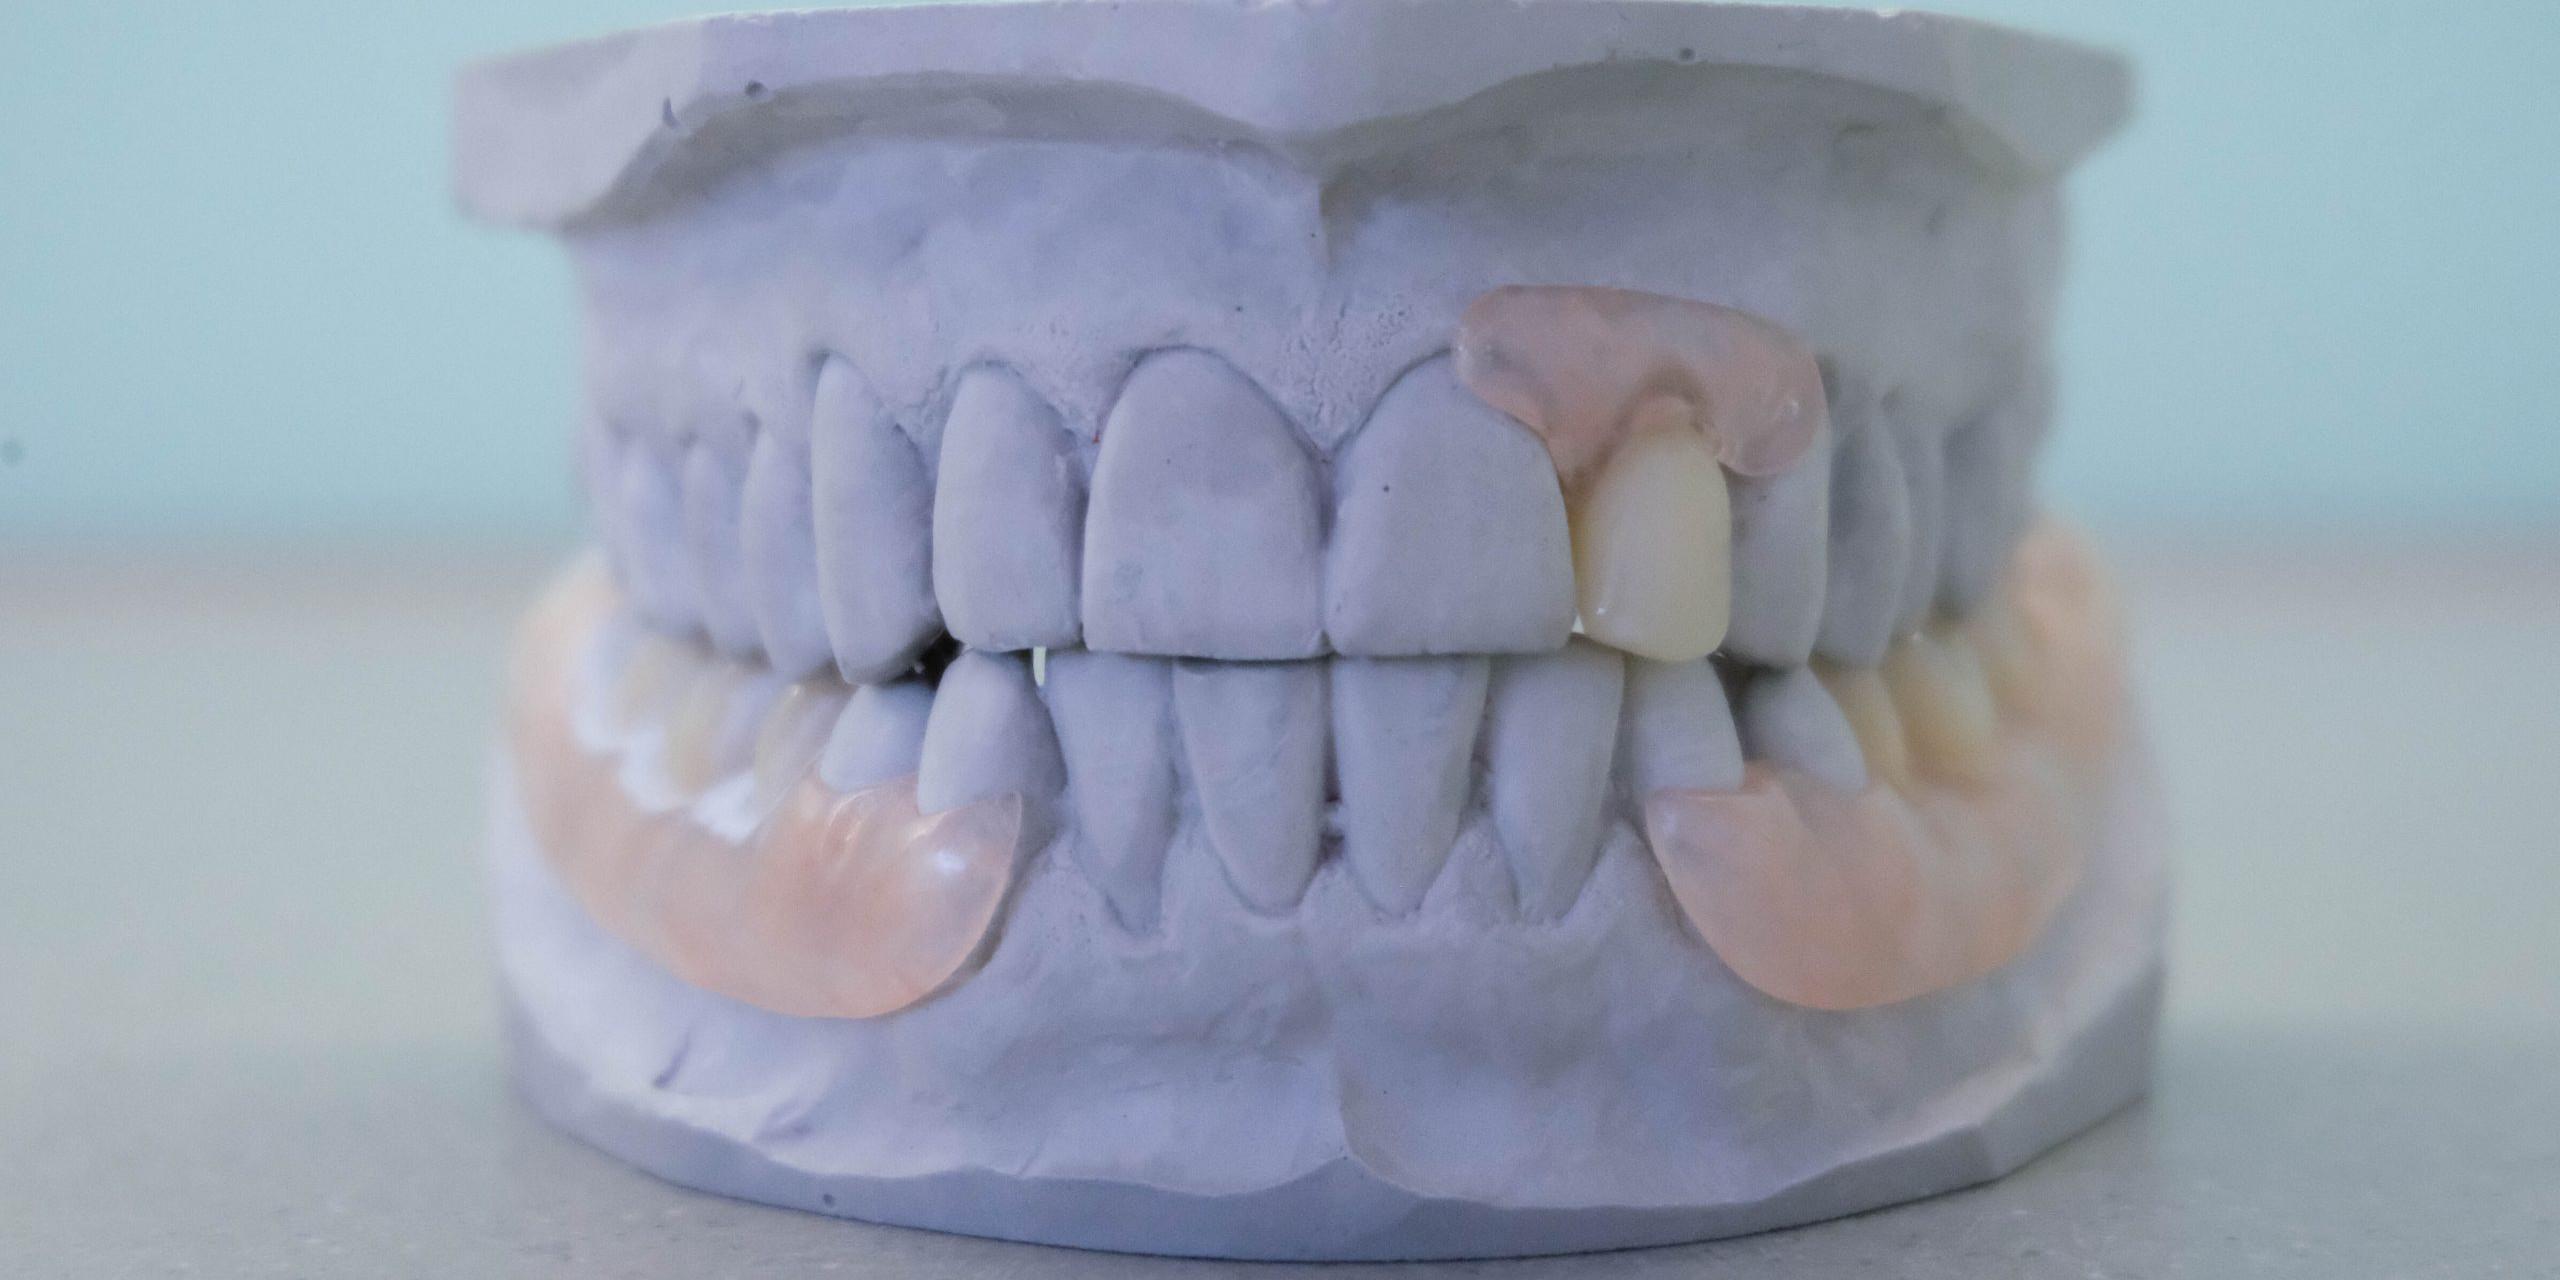 Prothese Zahnarzt Thun